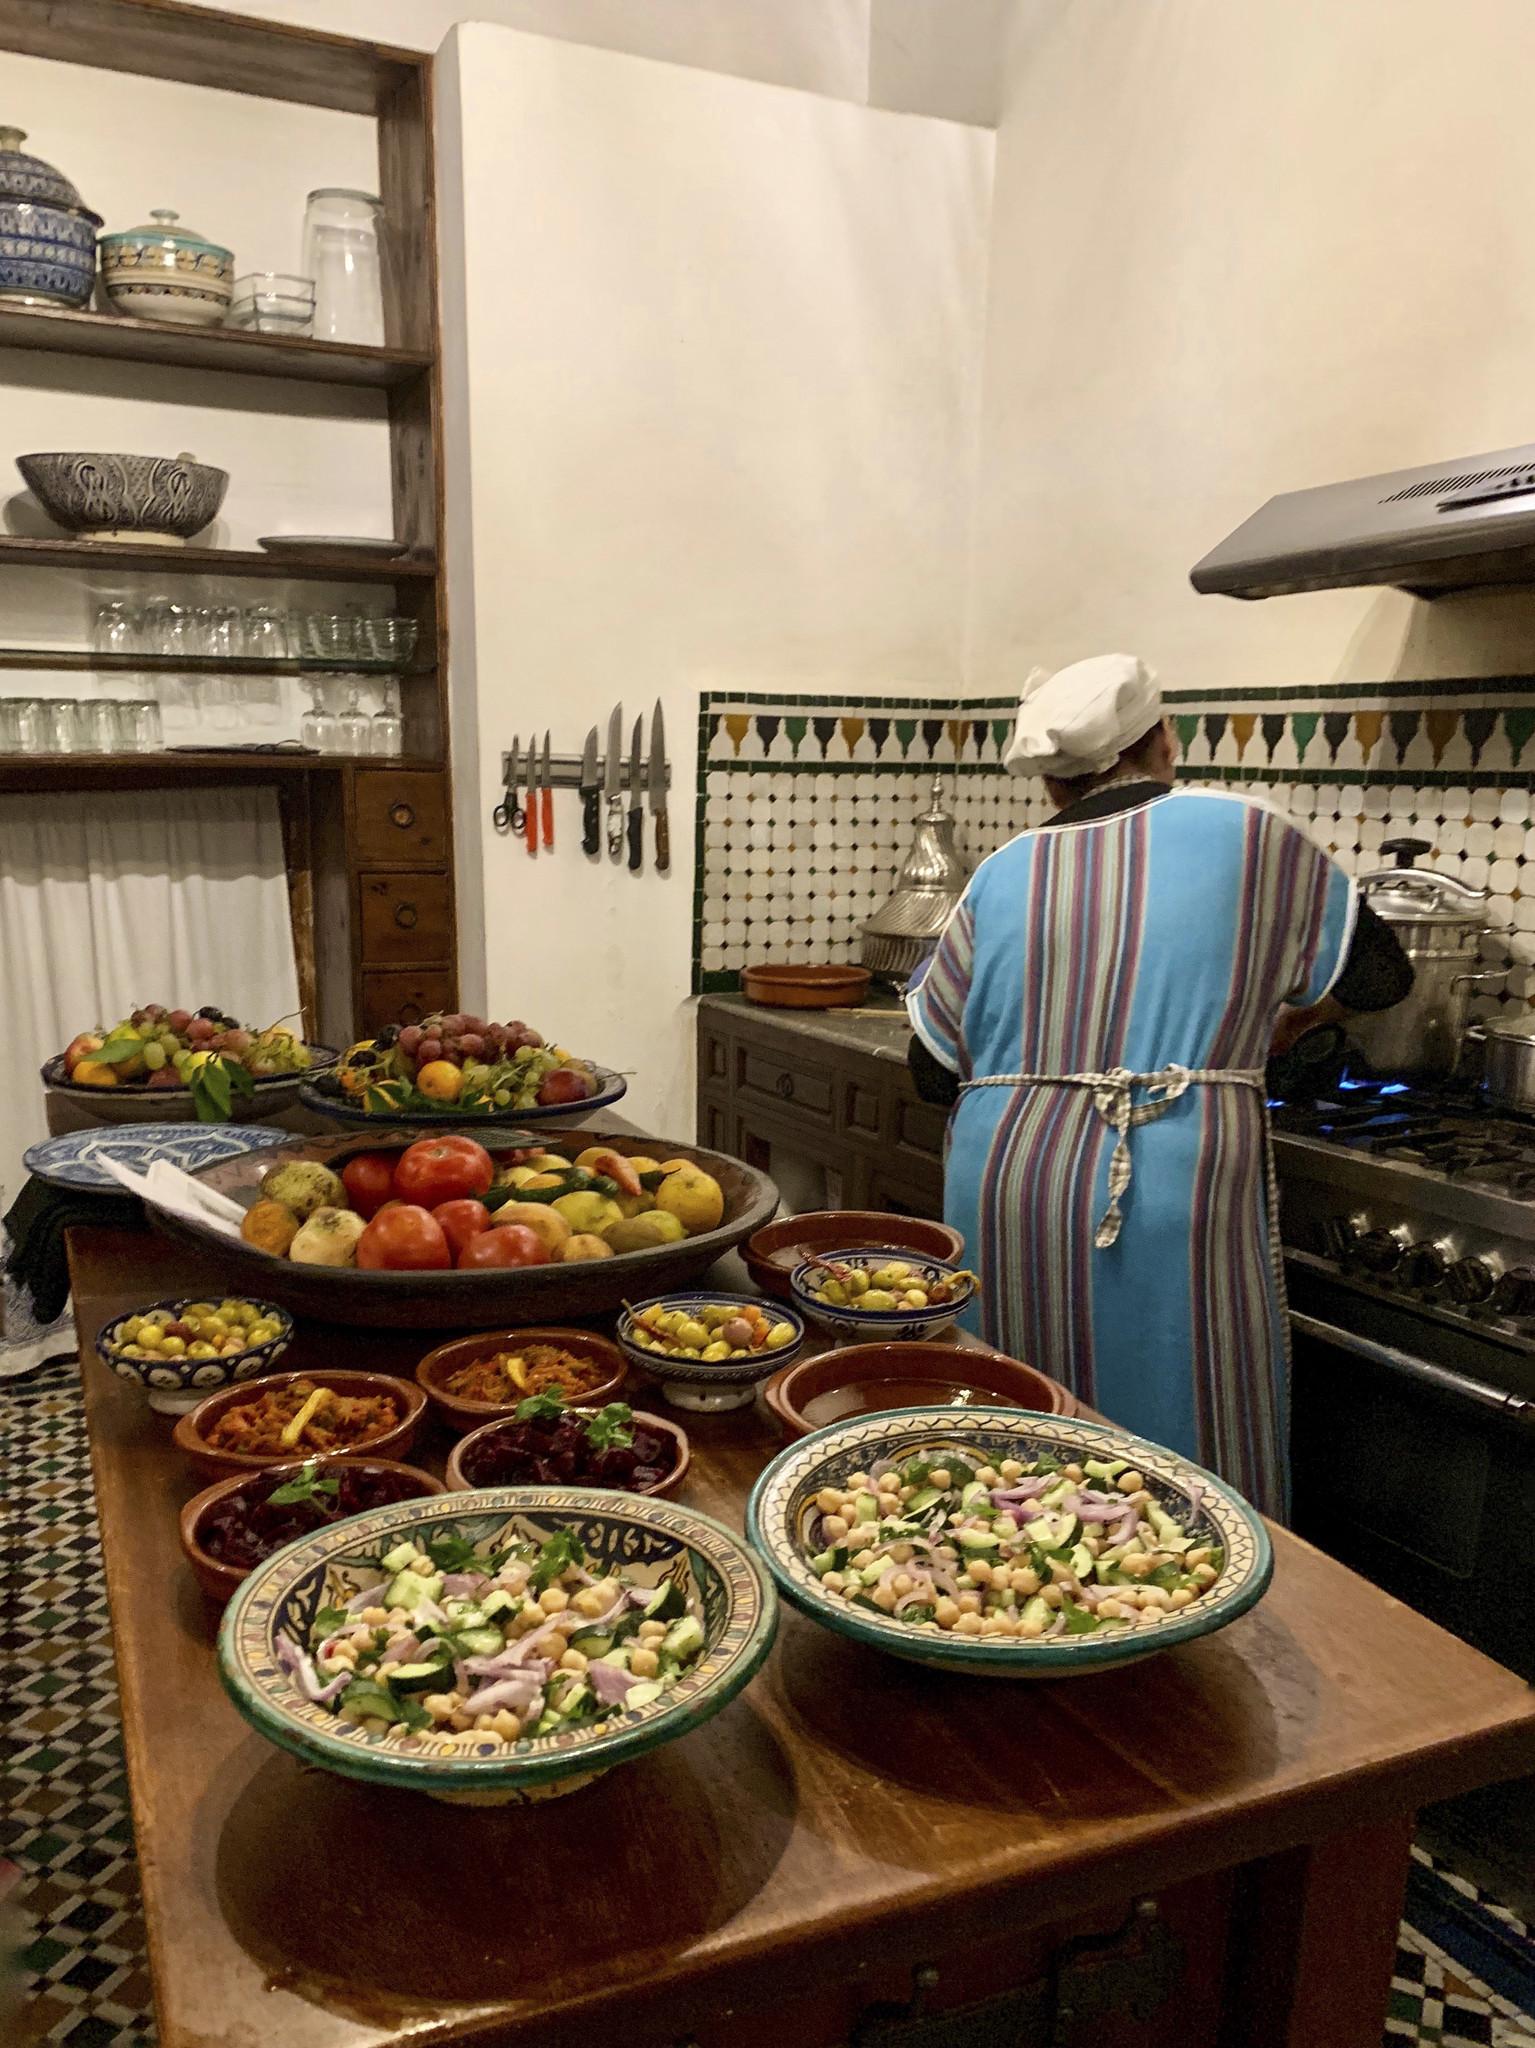 Картинки по запросу omelette